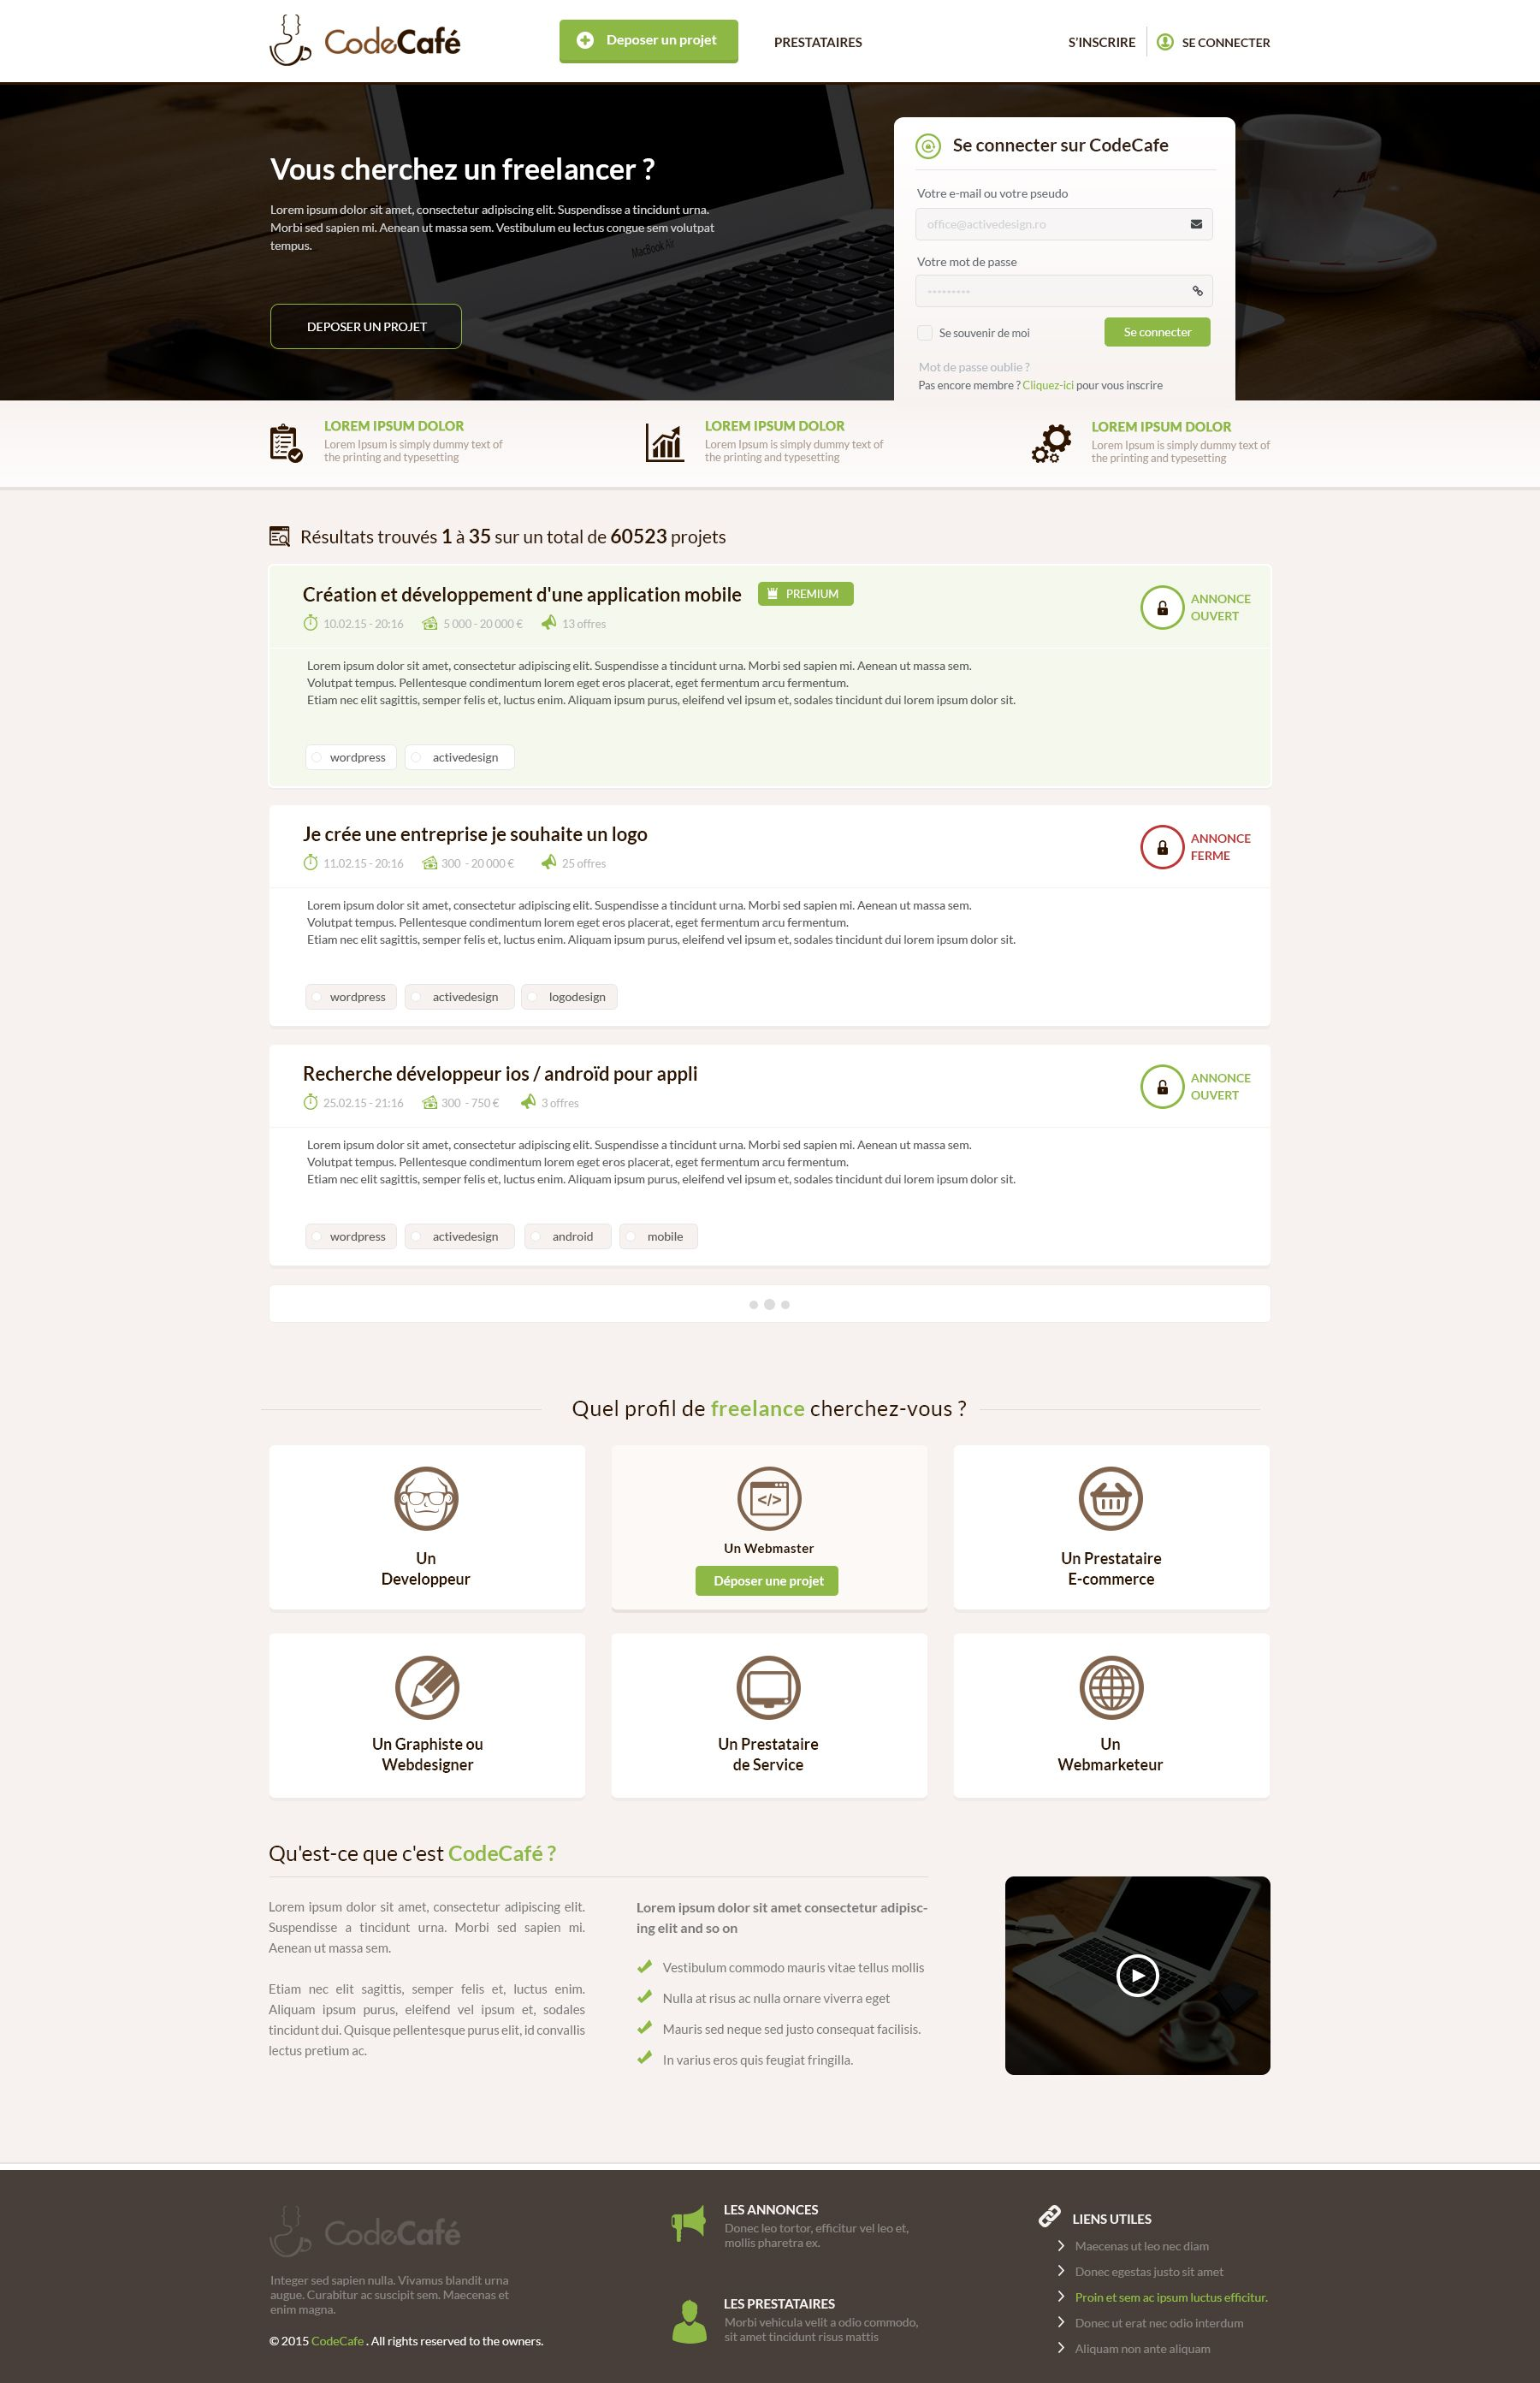 Codecafe website design